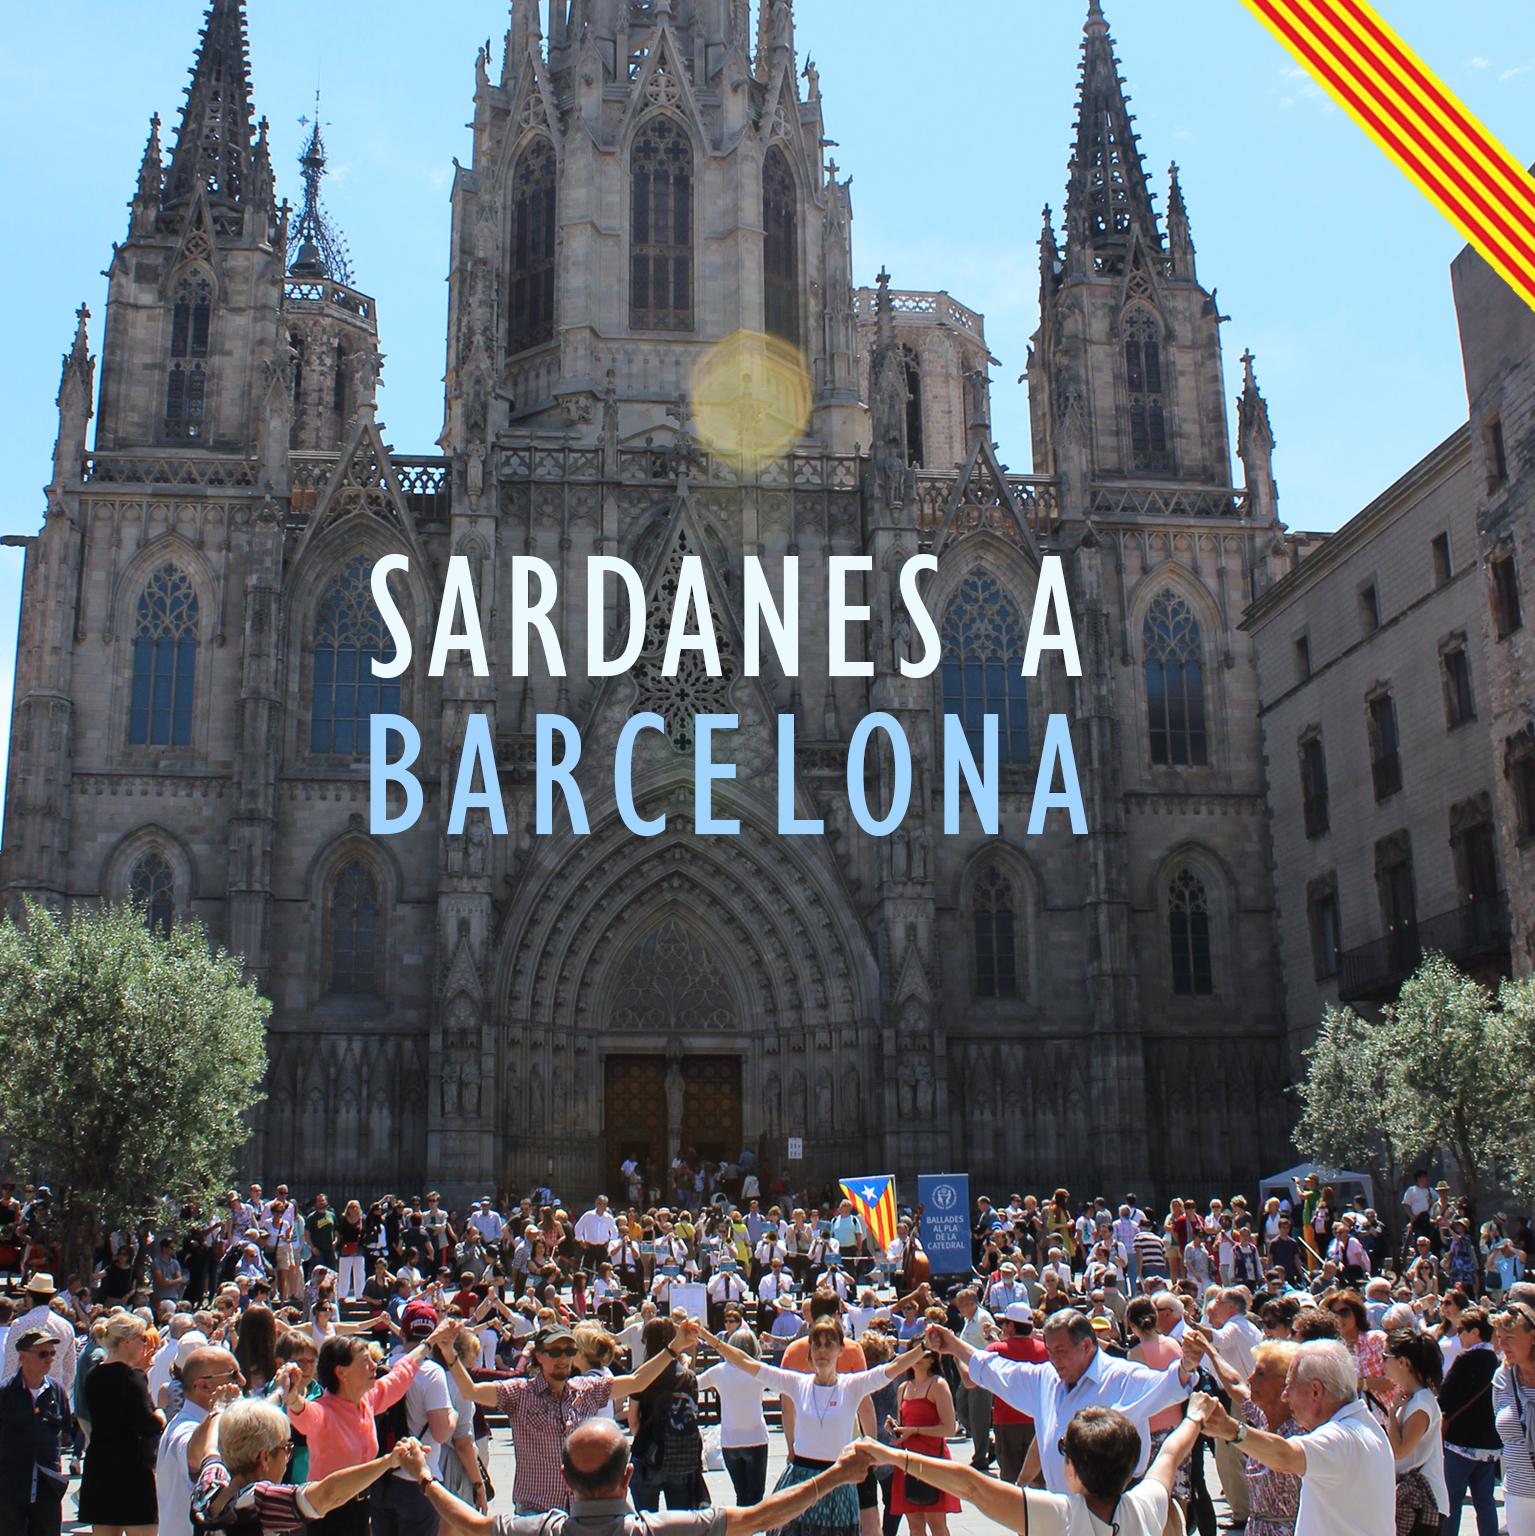 Ballada de sardanes @ Plaça Sant Jaume | Barcelona | Catalunya | Espanya